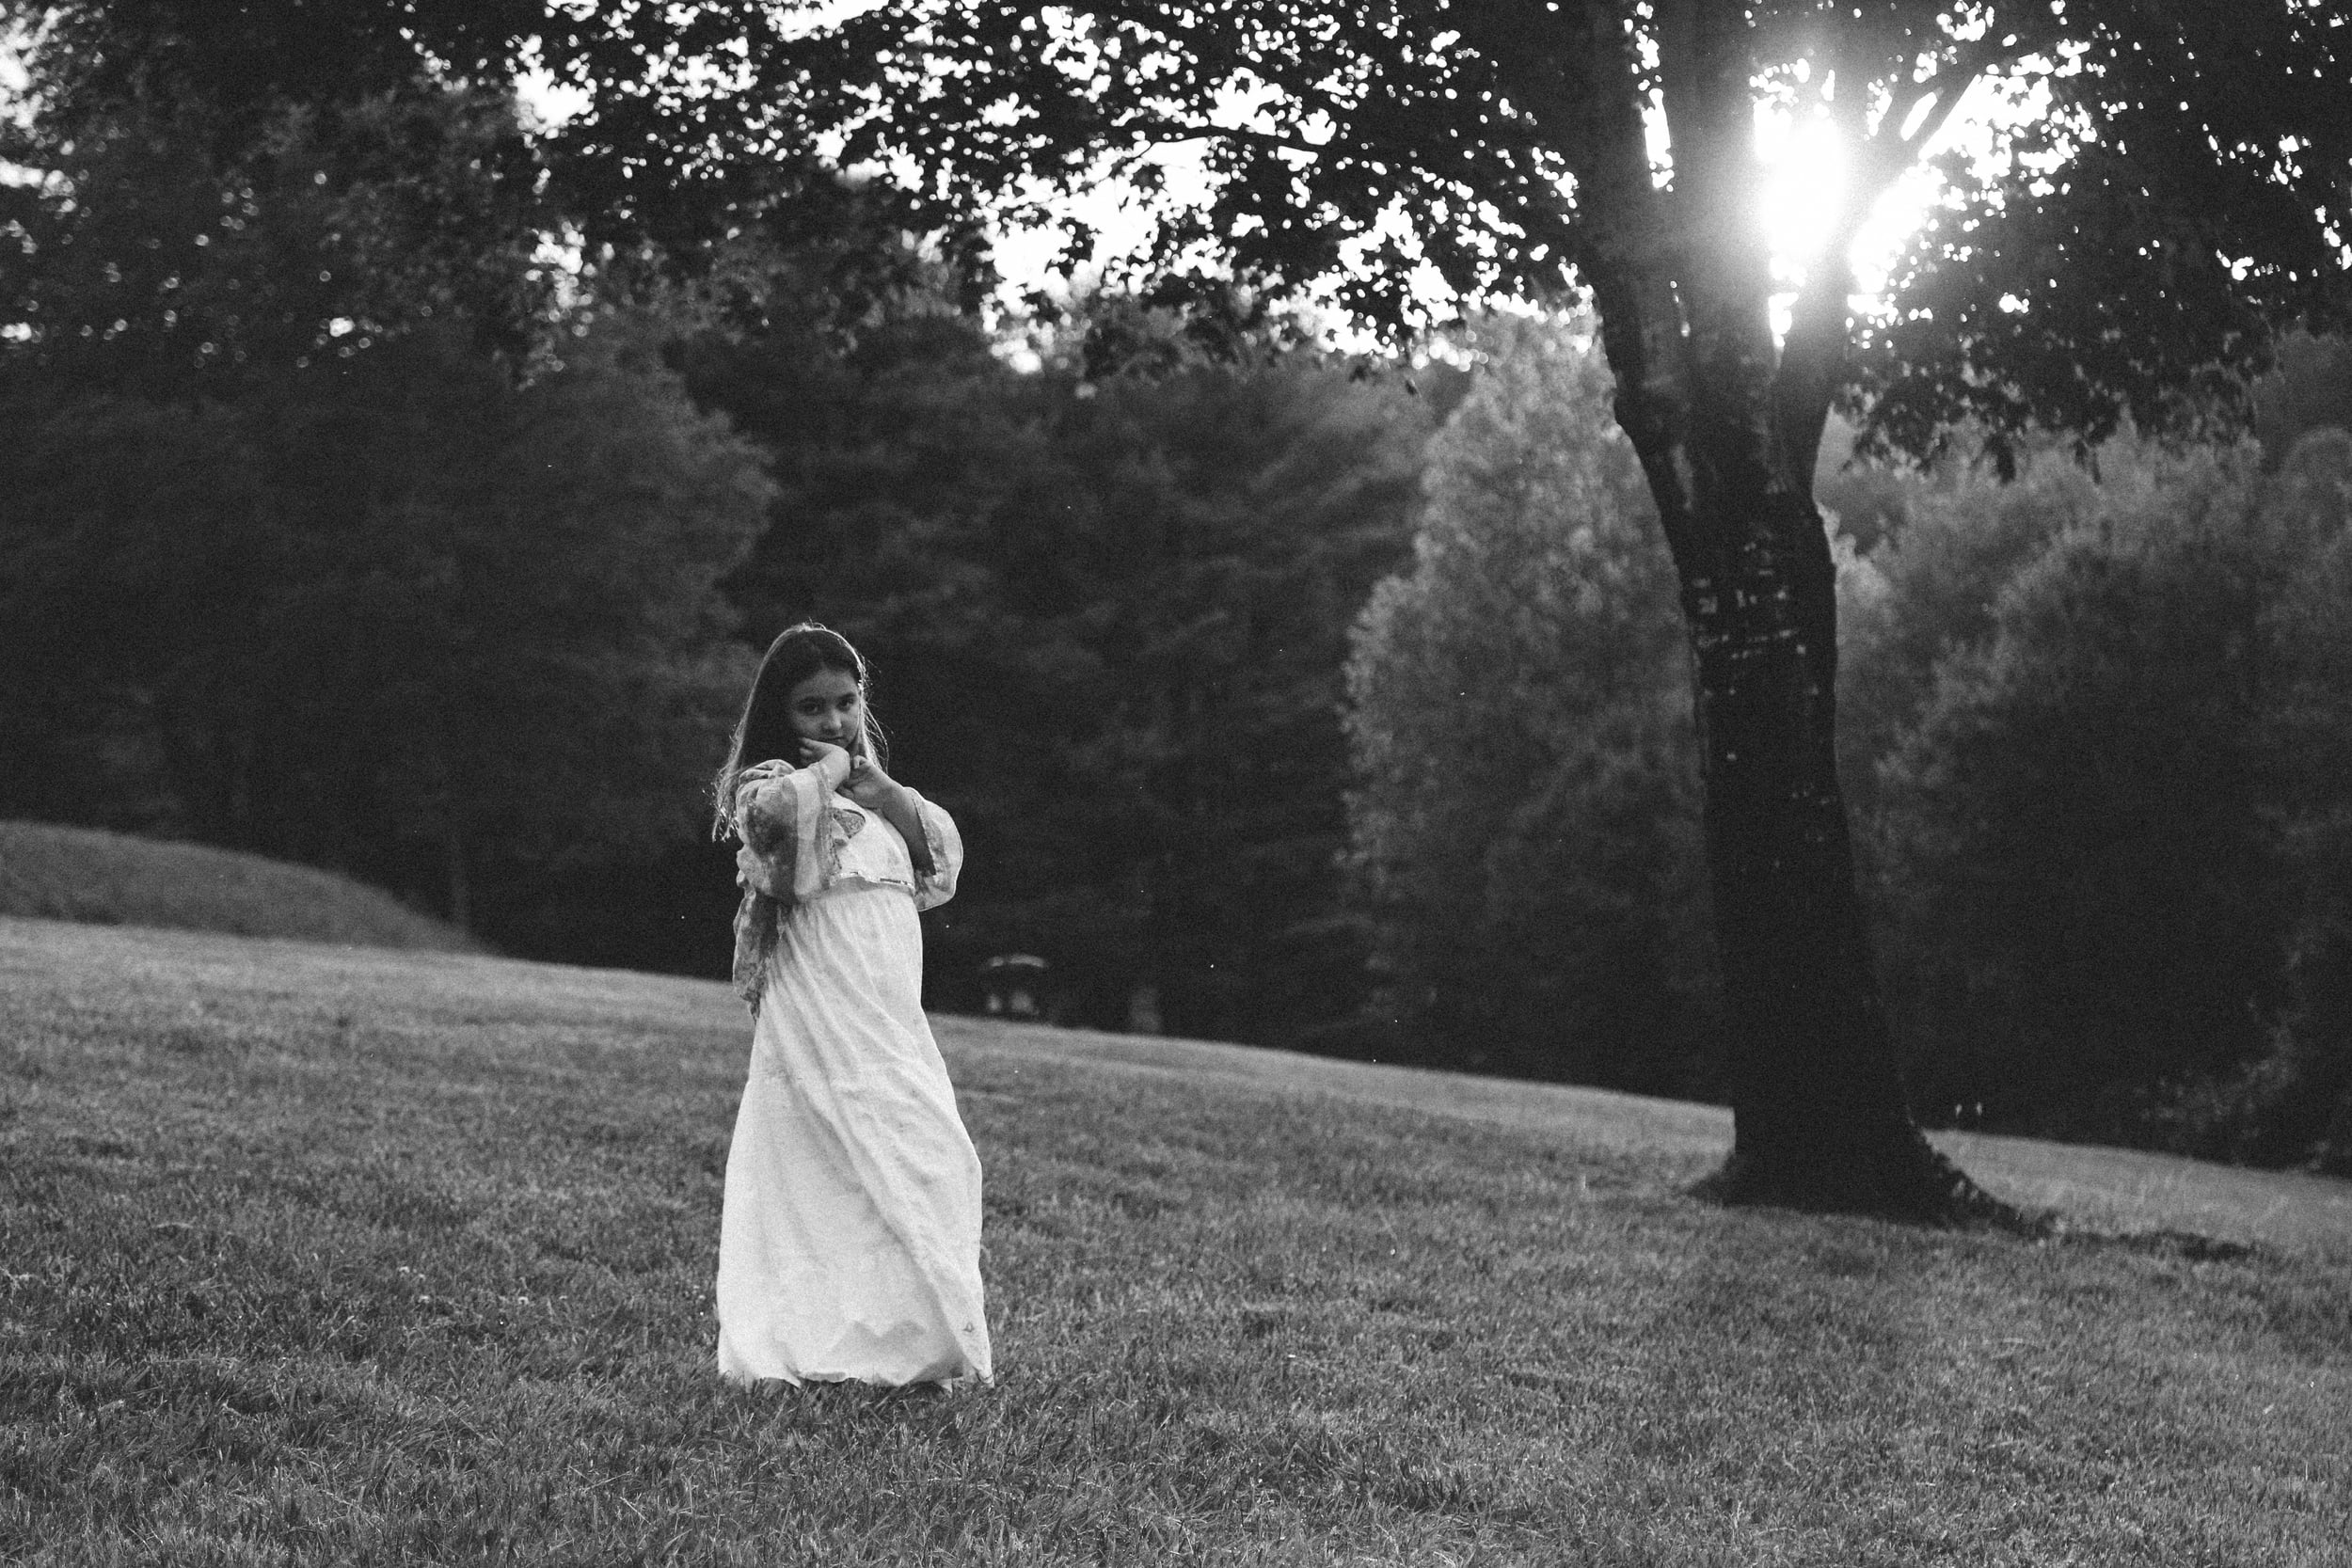 Chloe Summer 2015_Black and White (6).jpg